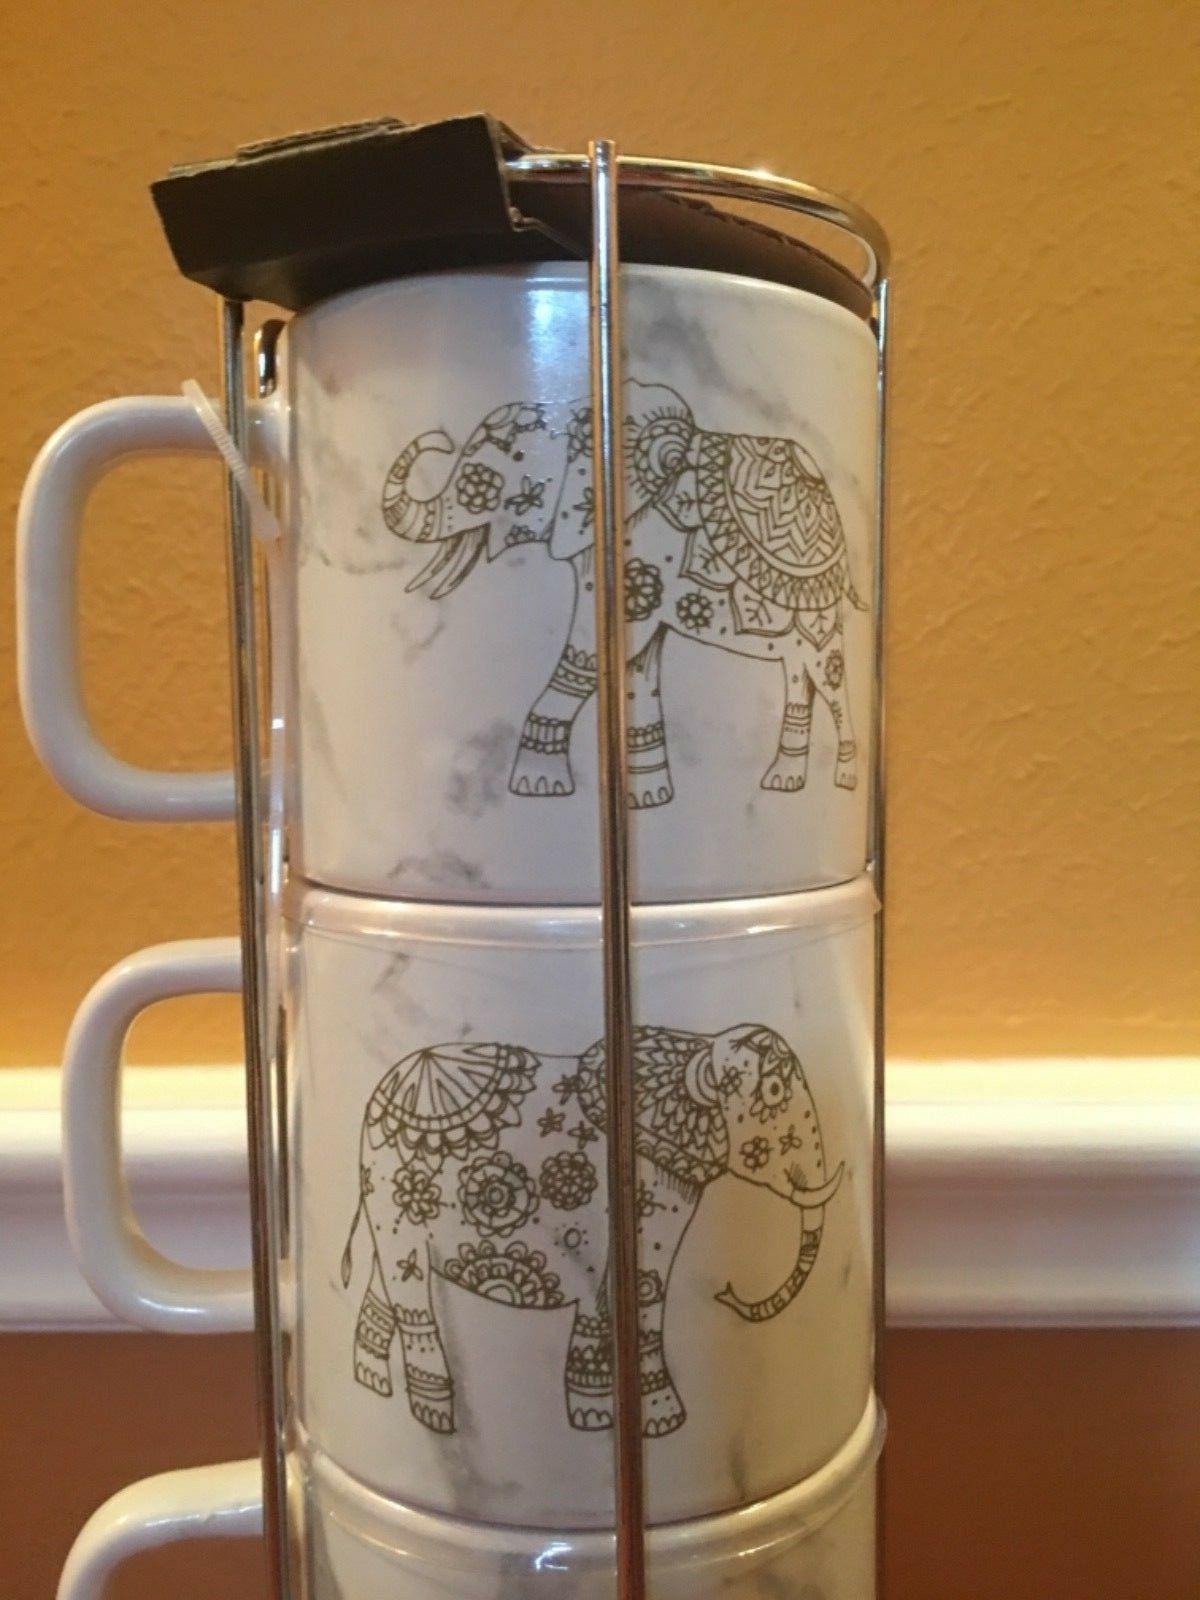 4 Stacking Porcelain Mugs Stainless Steel